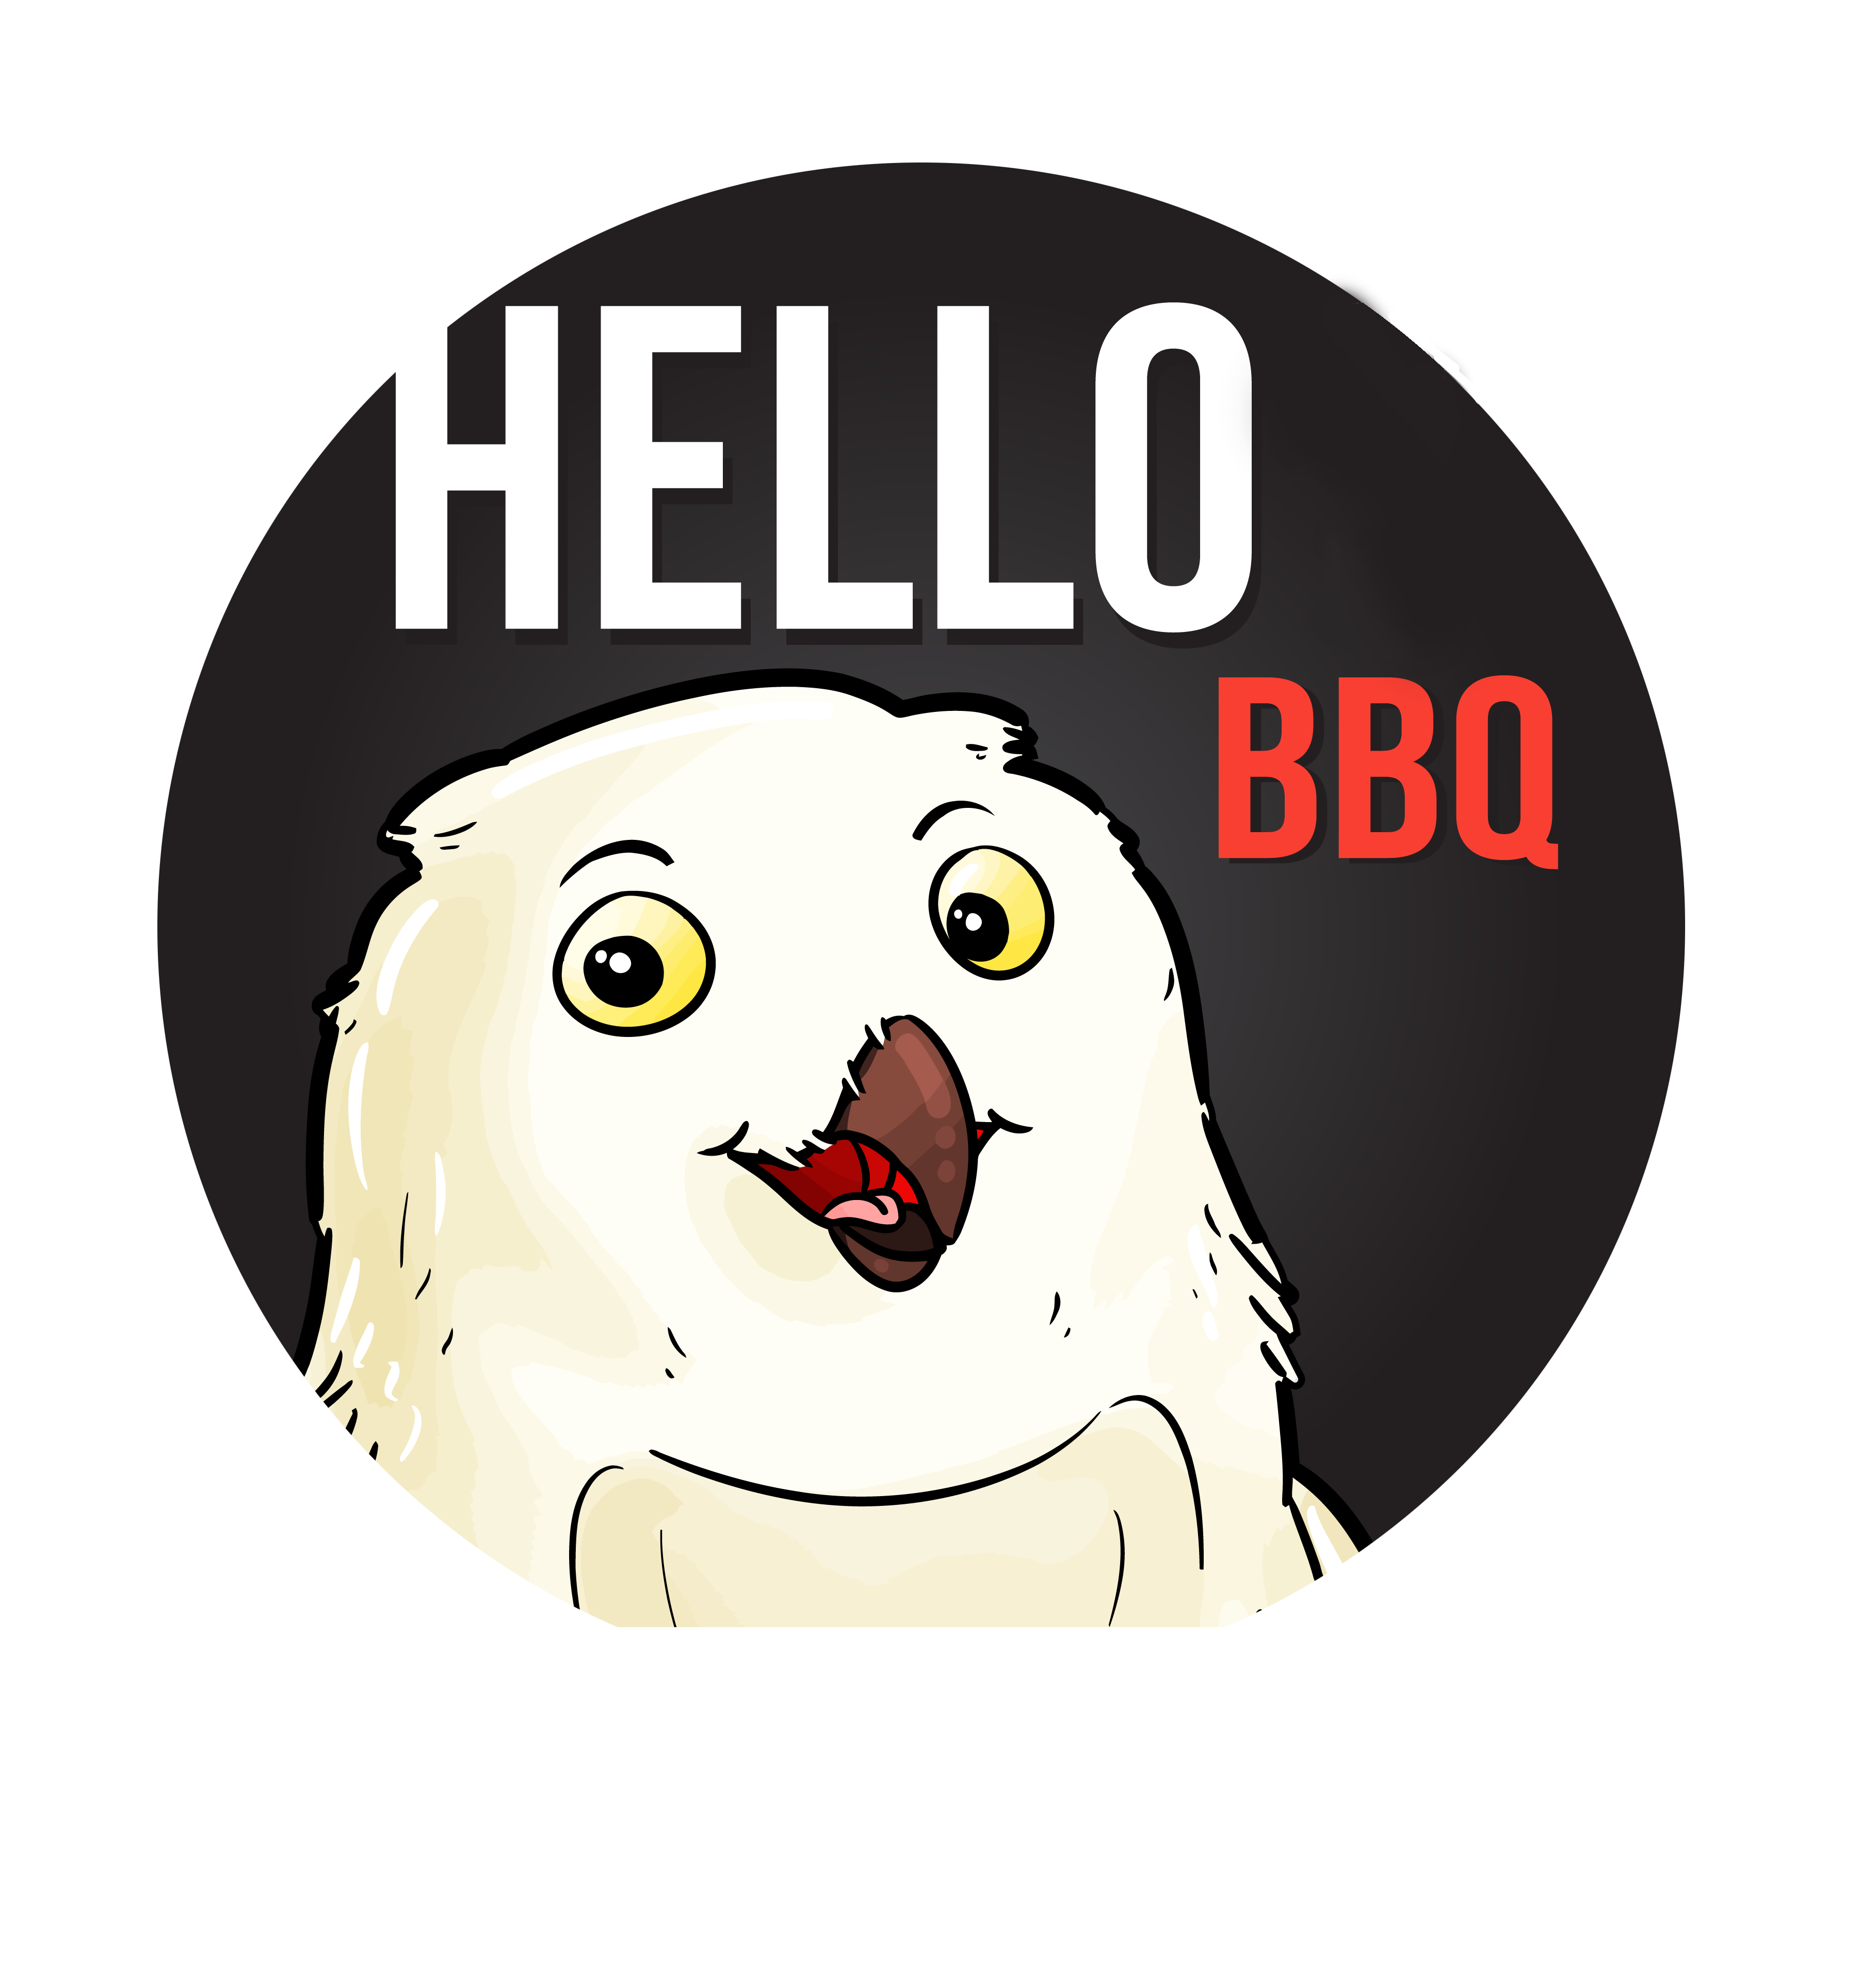 HELLO BBQ